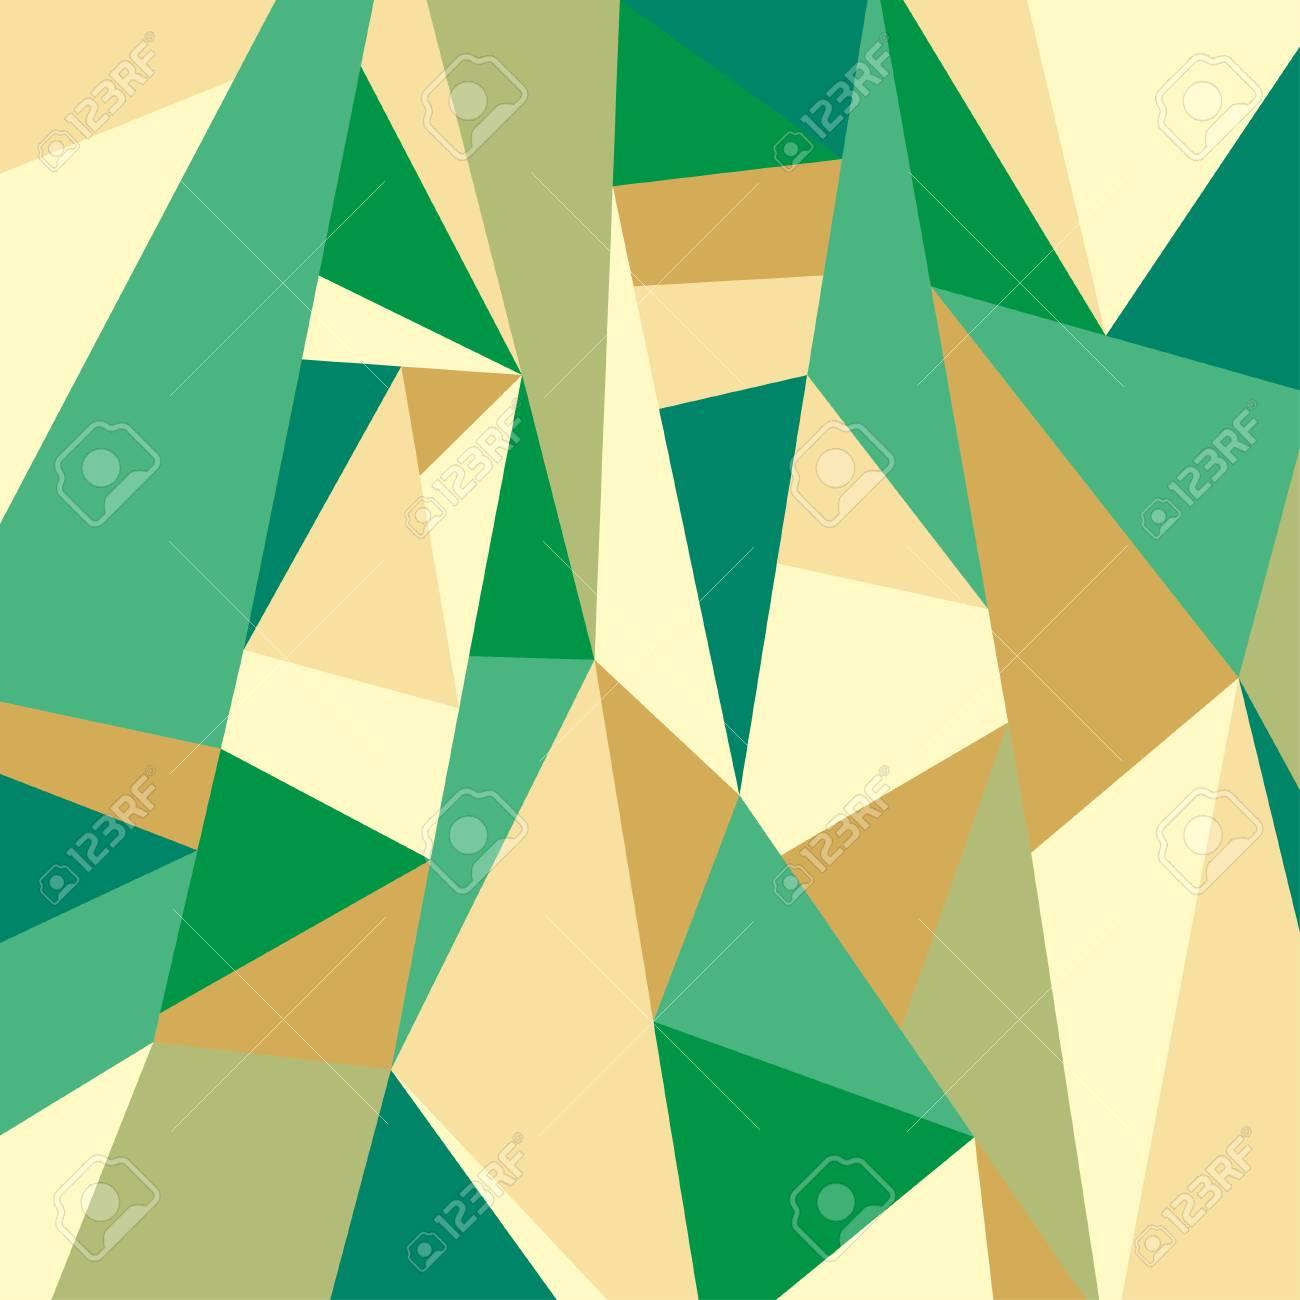 universal pattern abstract geometric